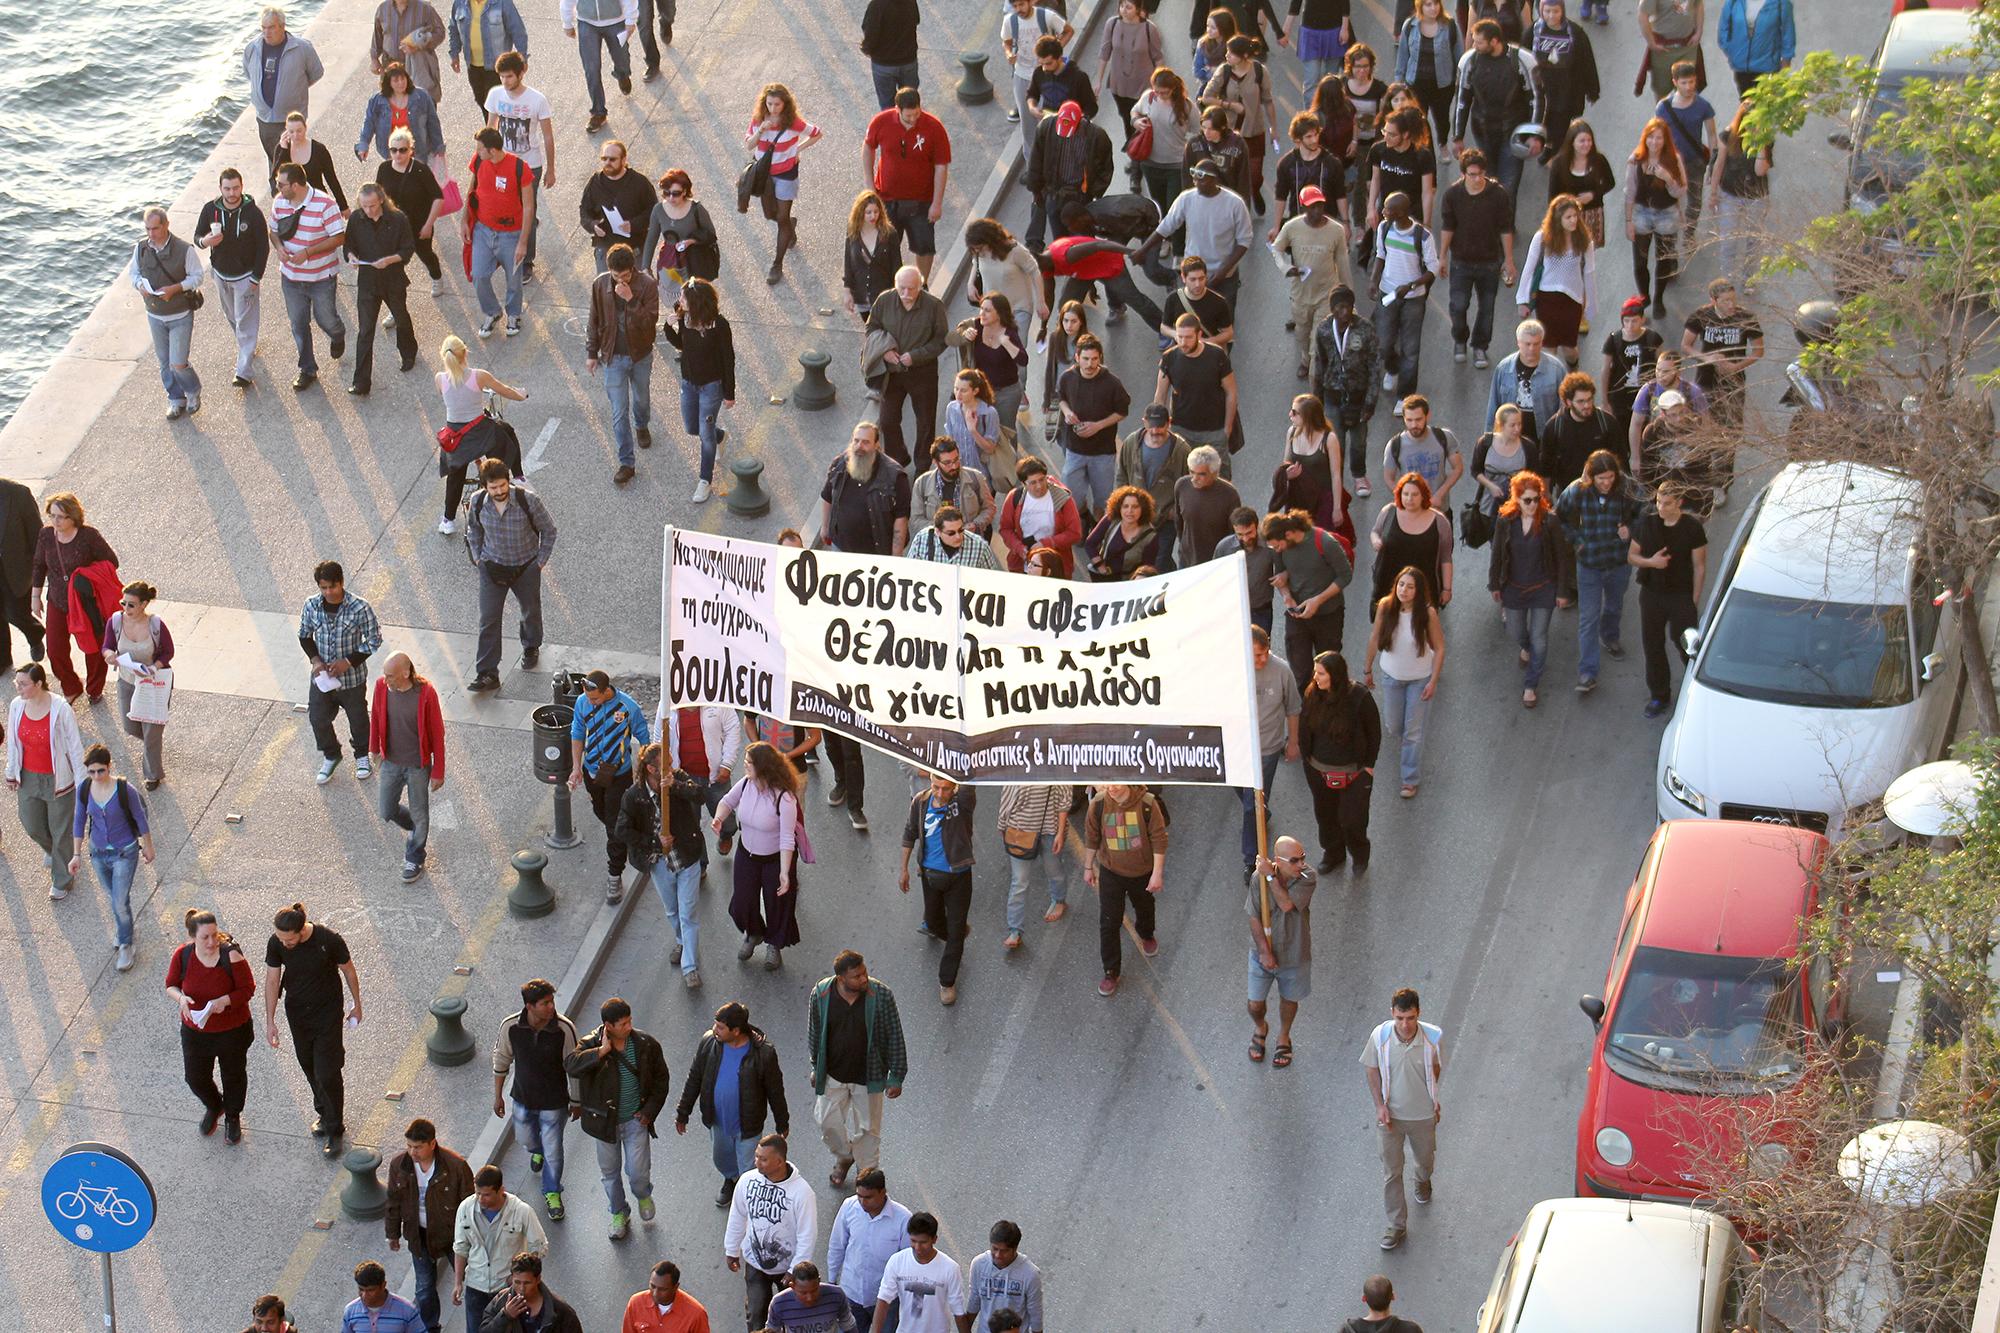 Thessaloniki protestors